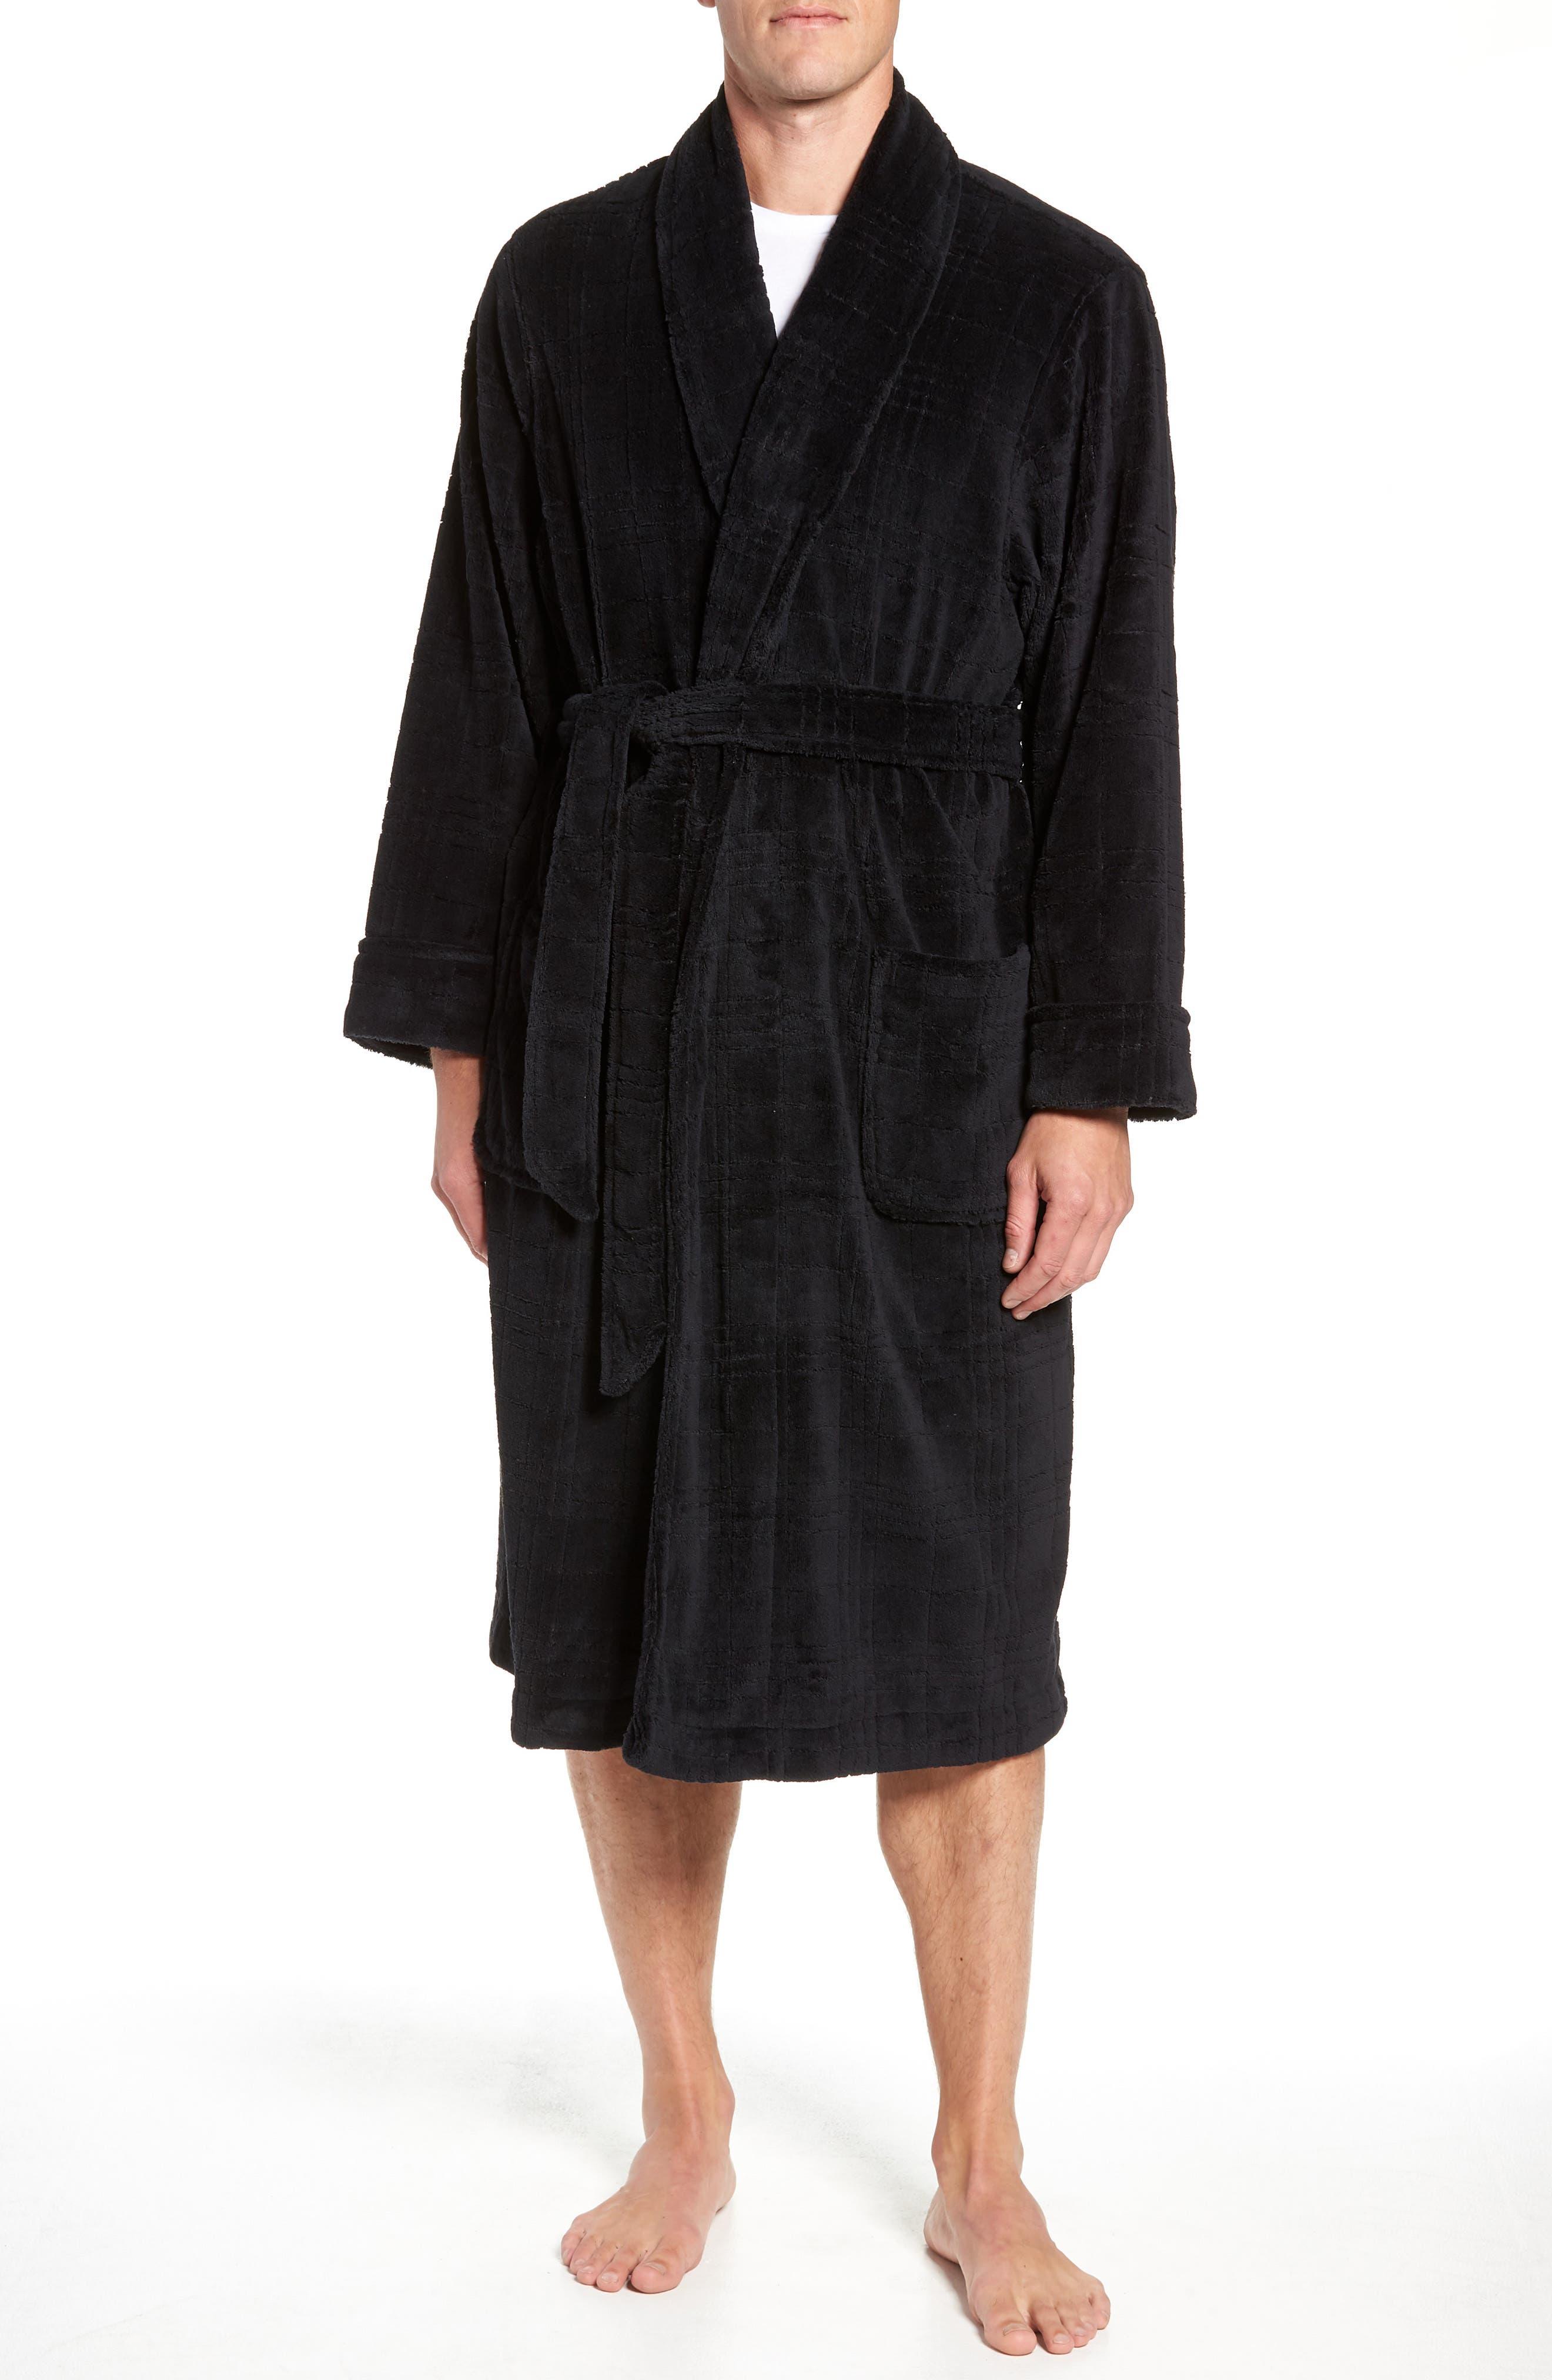 NORDSTROM MEN'S SHOP, Shadow Plaid Fleece Robe, Main thumbnail 1, color, BLACK